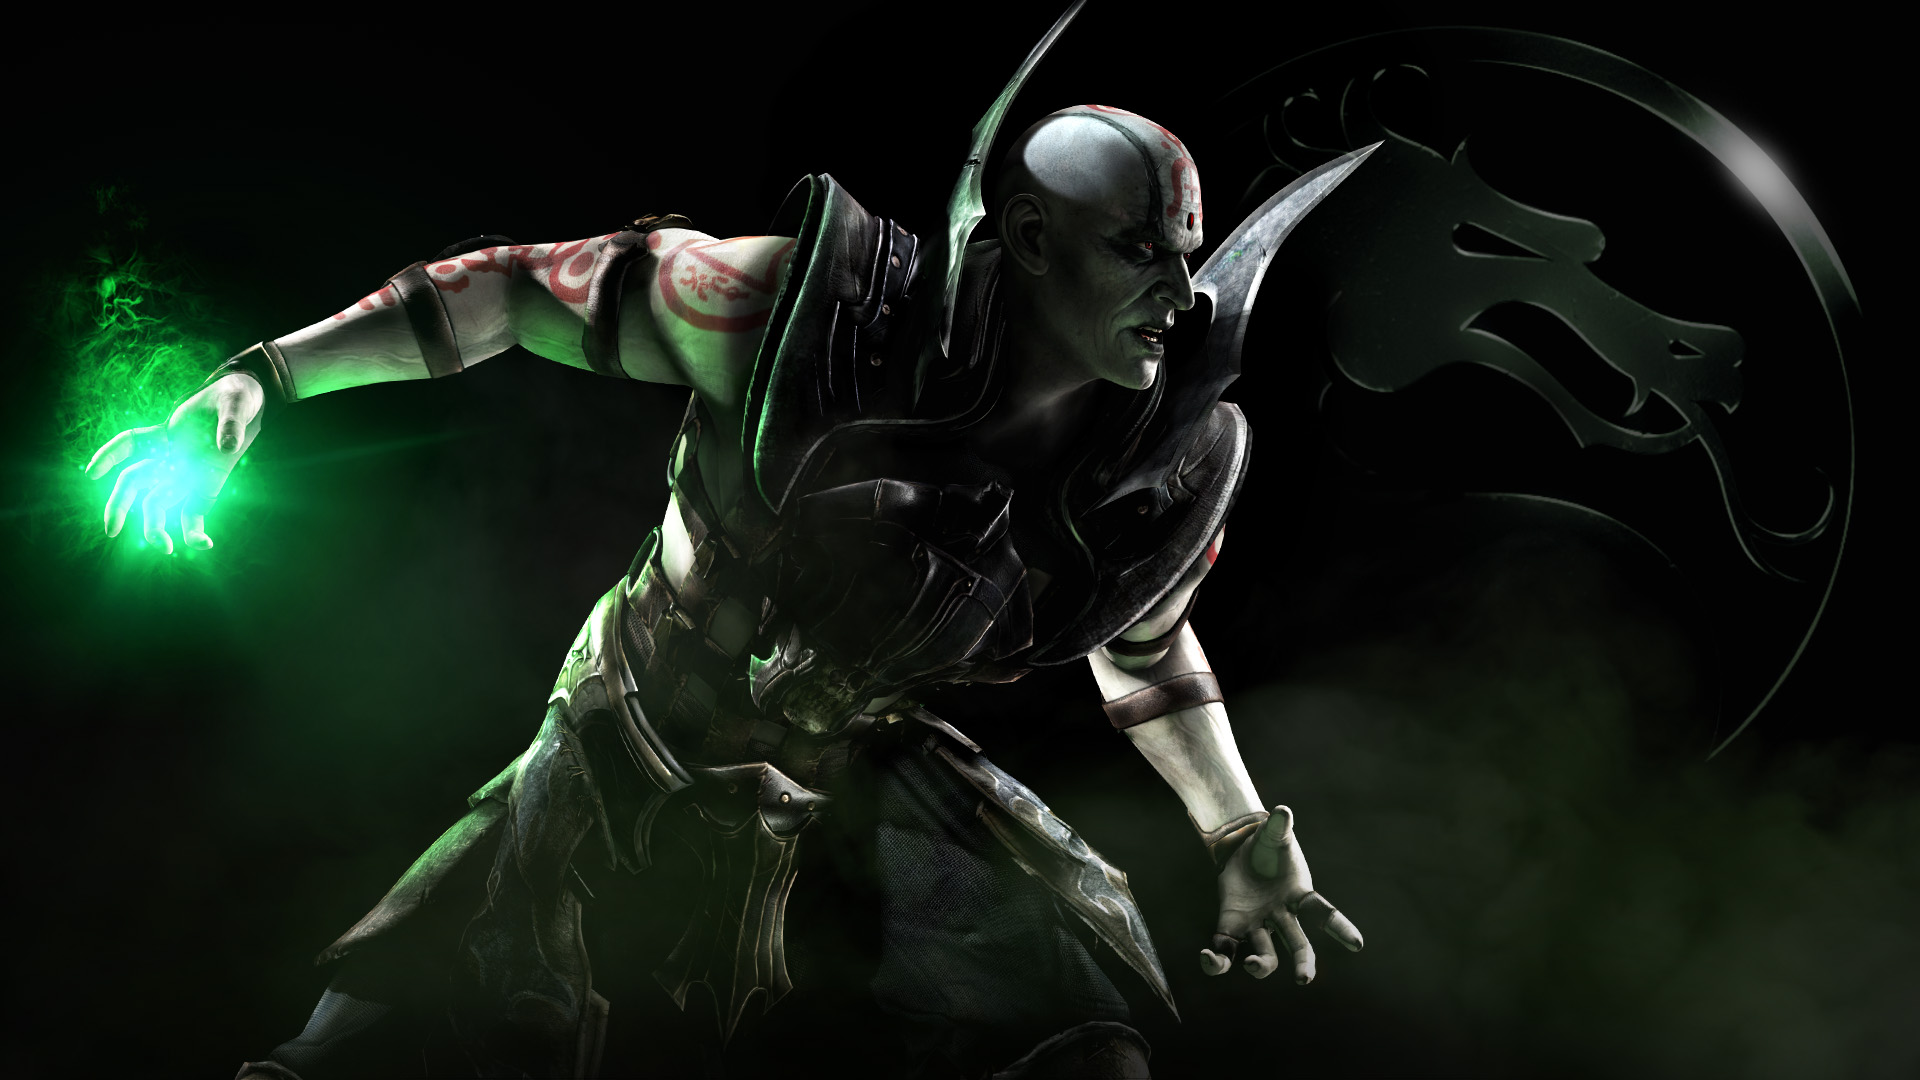 Mortal Kombat X wallpaper 1